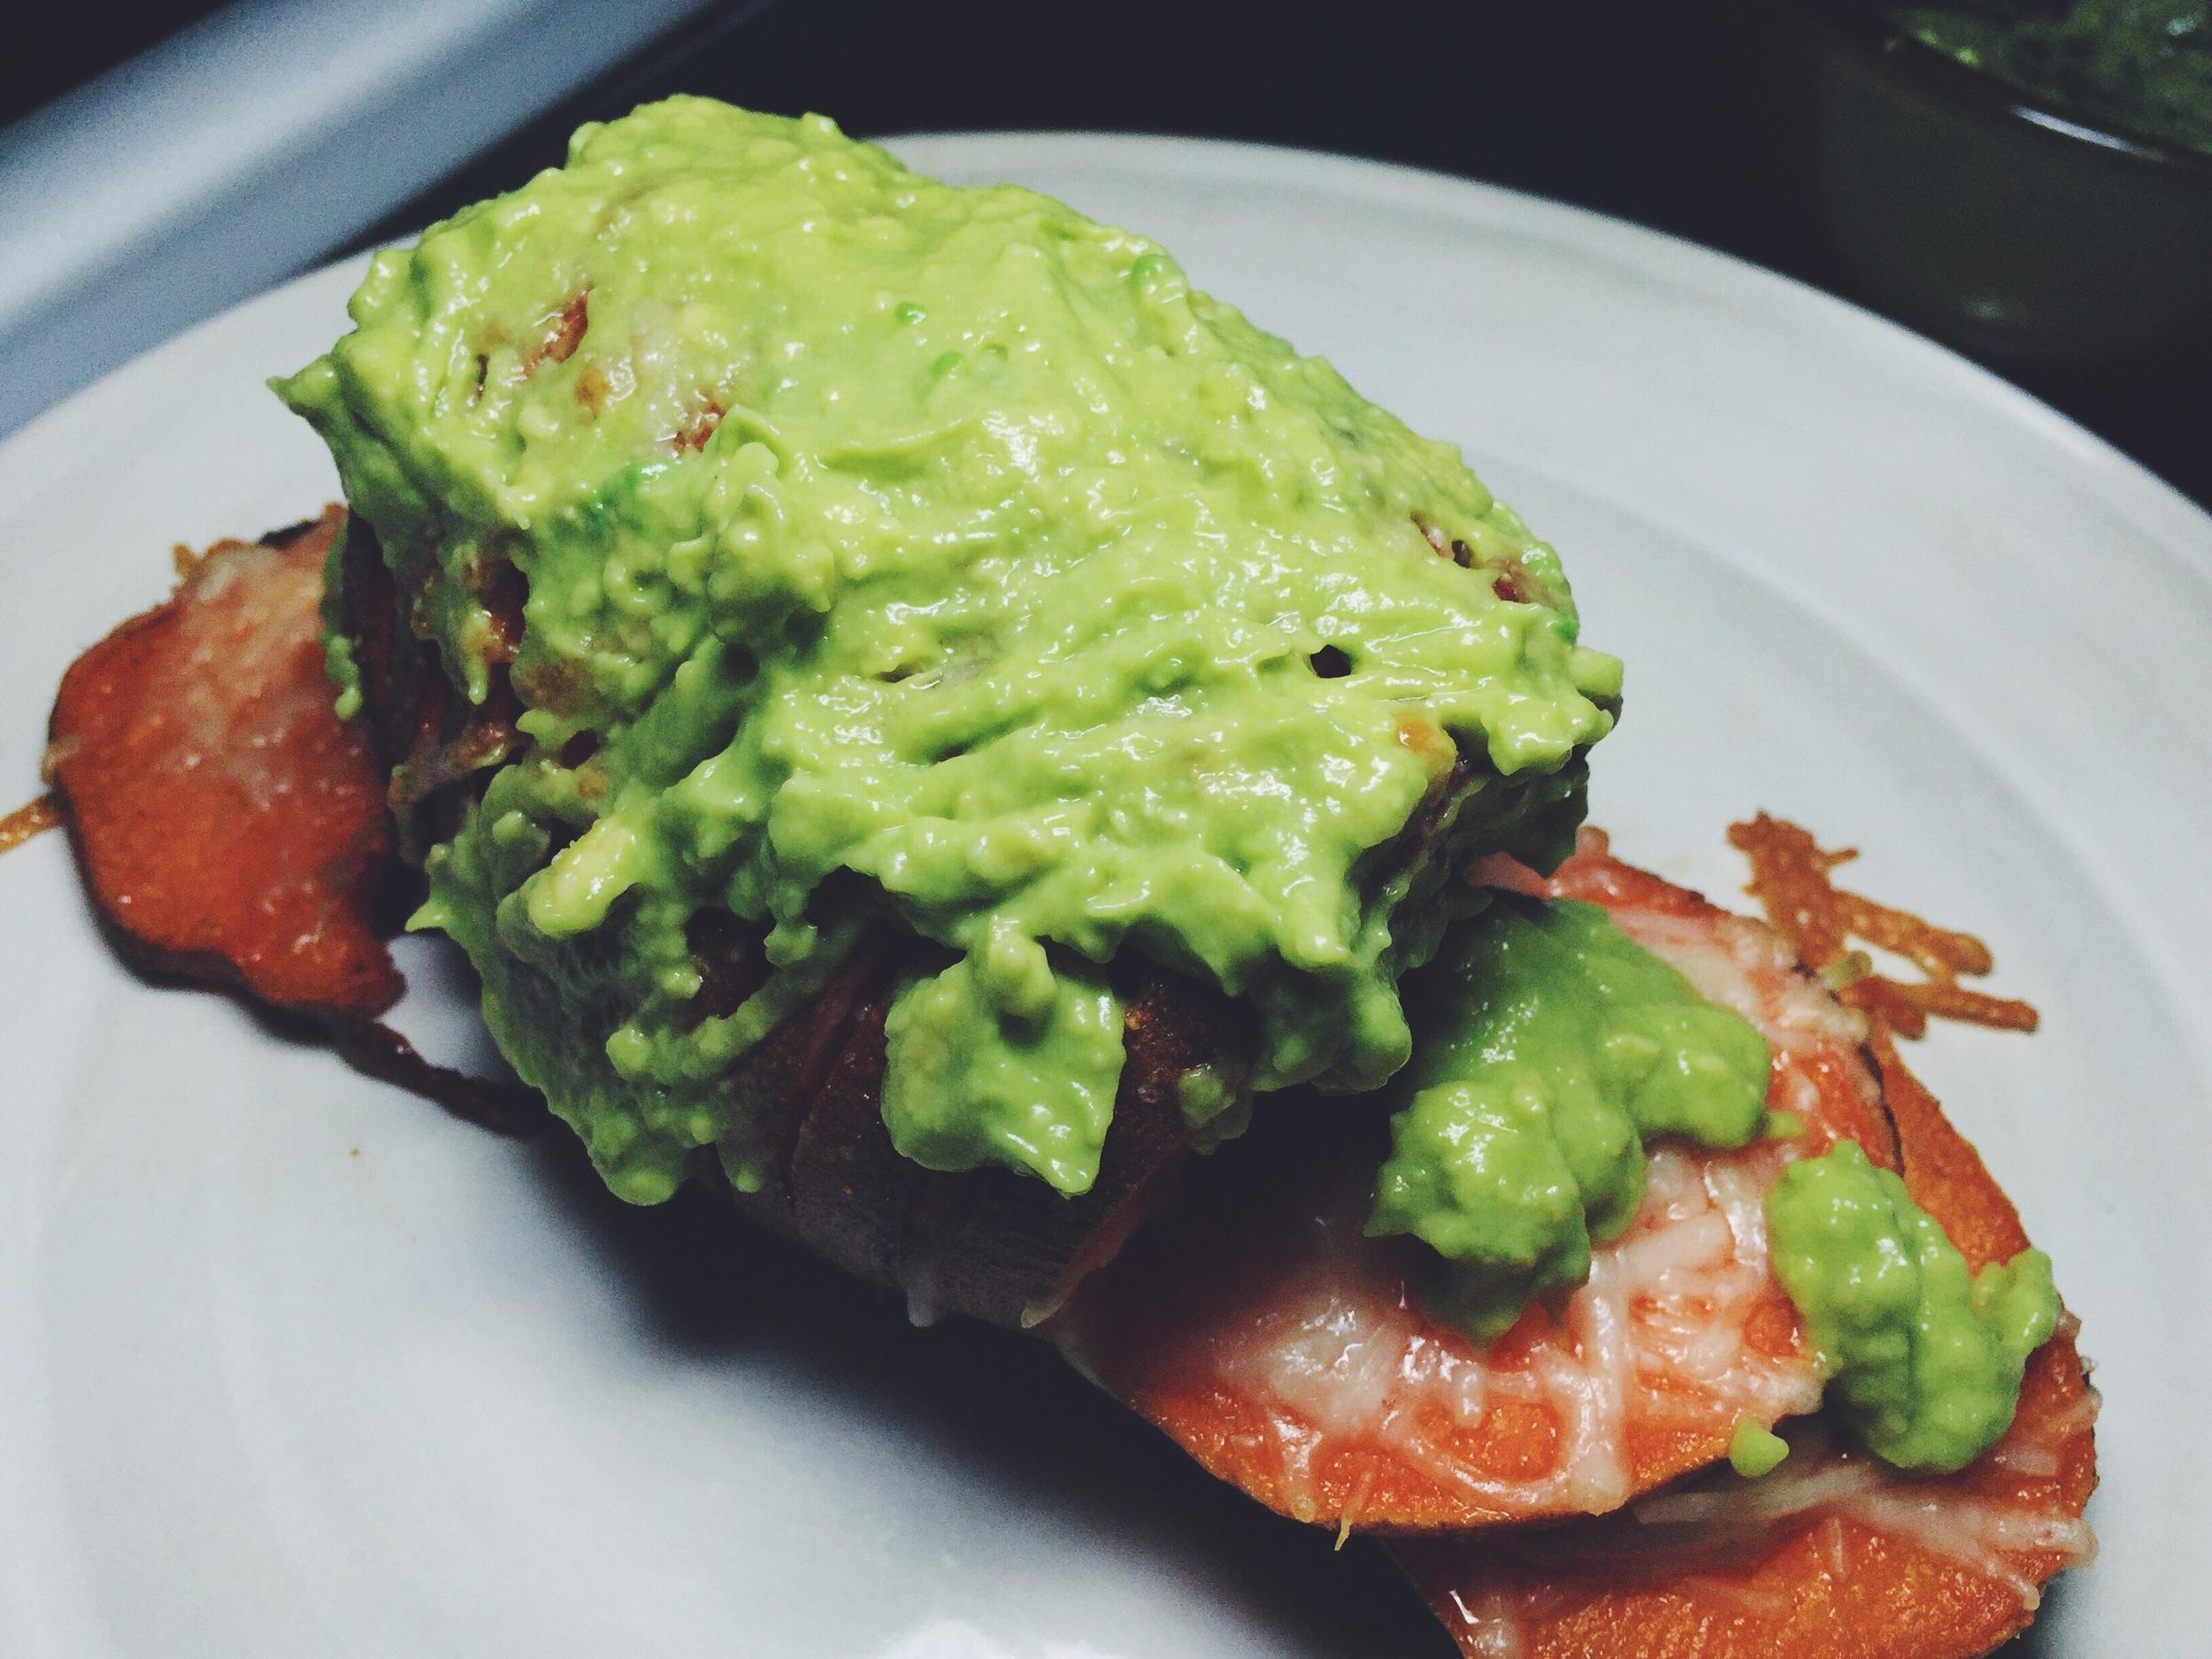 parmesan hasselback sweet potato with avocado cream